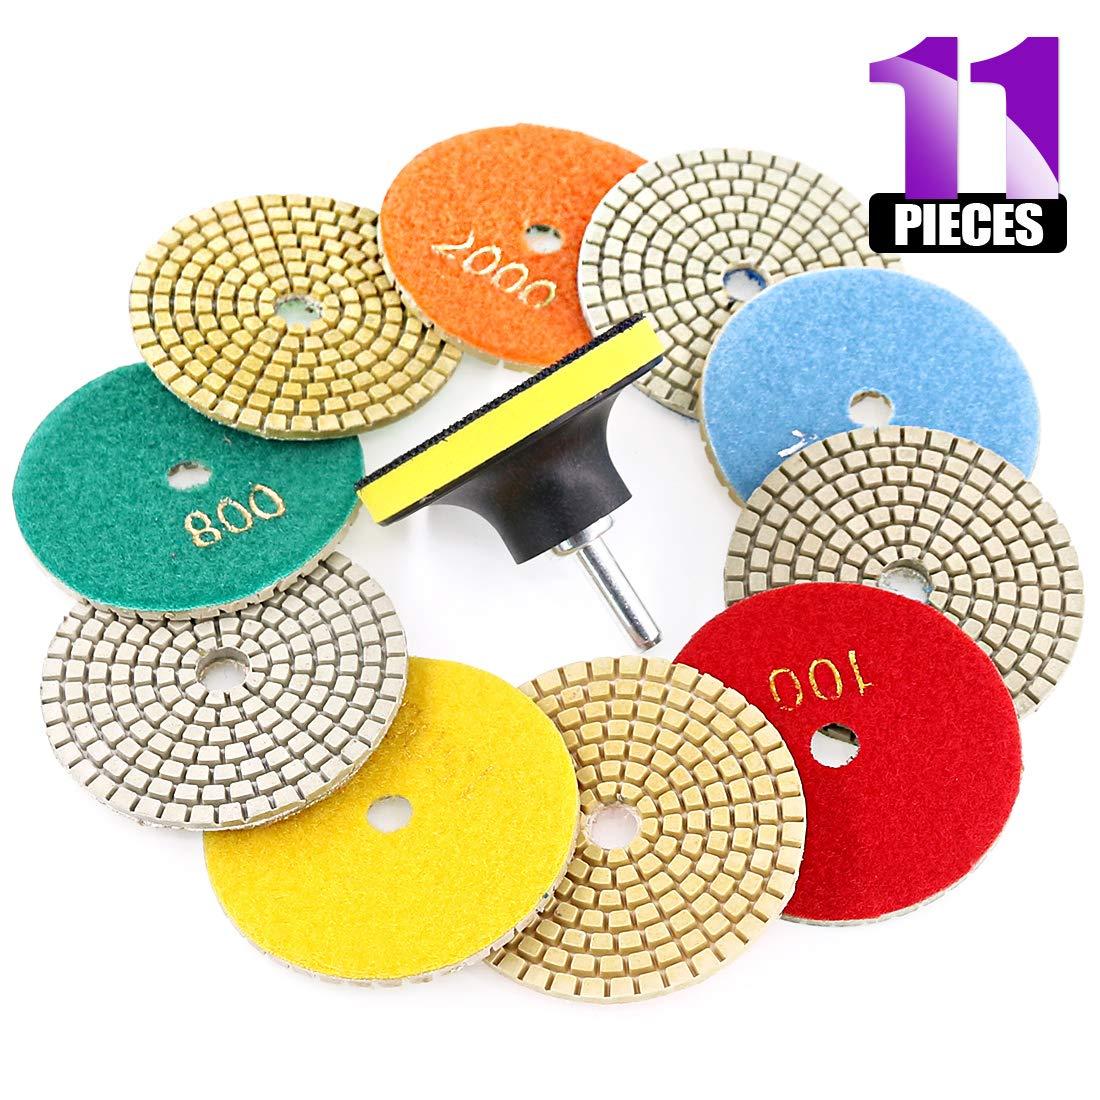 Swpeet 11Pcs Diamond Polishing Pads Kit, 10Pcs 3 Inch Wet/Dry Polishing Kit Polishing pads Kit with 1Pcs 3 Inch Yellow Backer Pad for Granite Marble Stone Glass Quartz Polishing by Swpeet